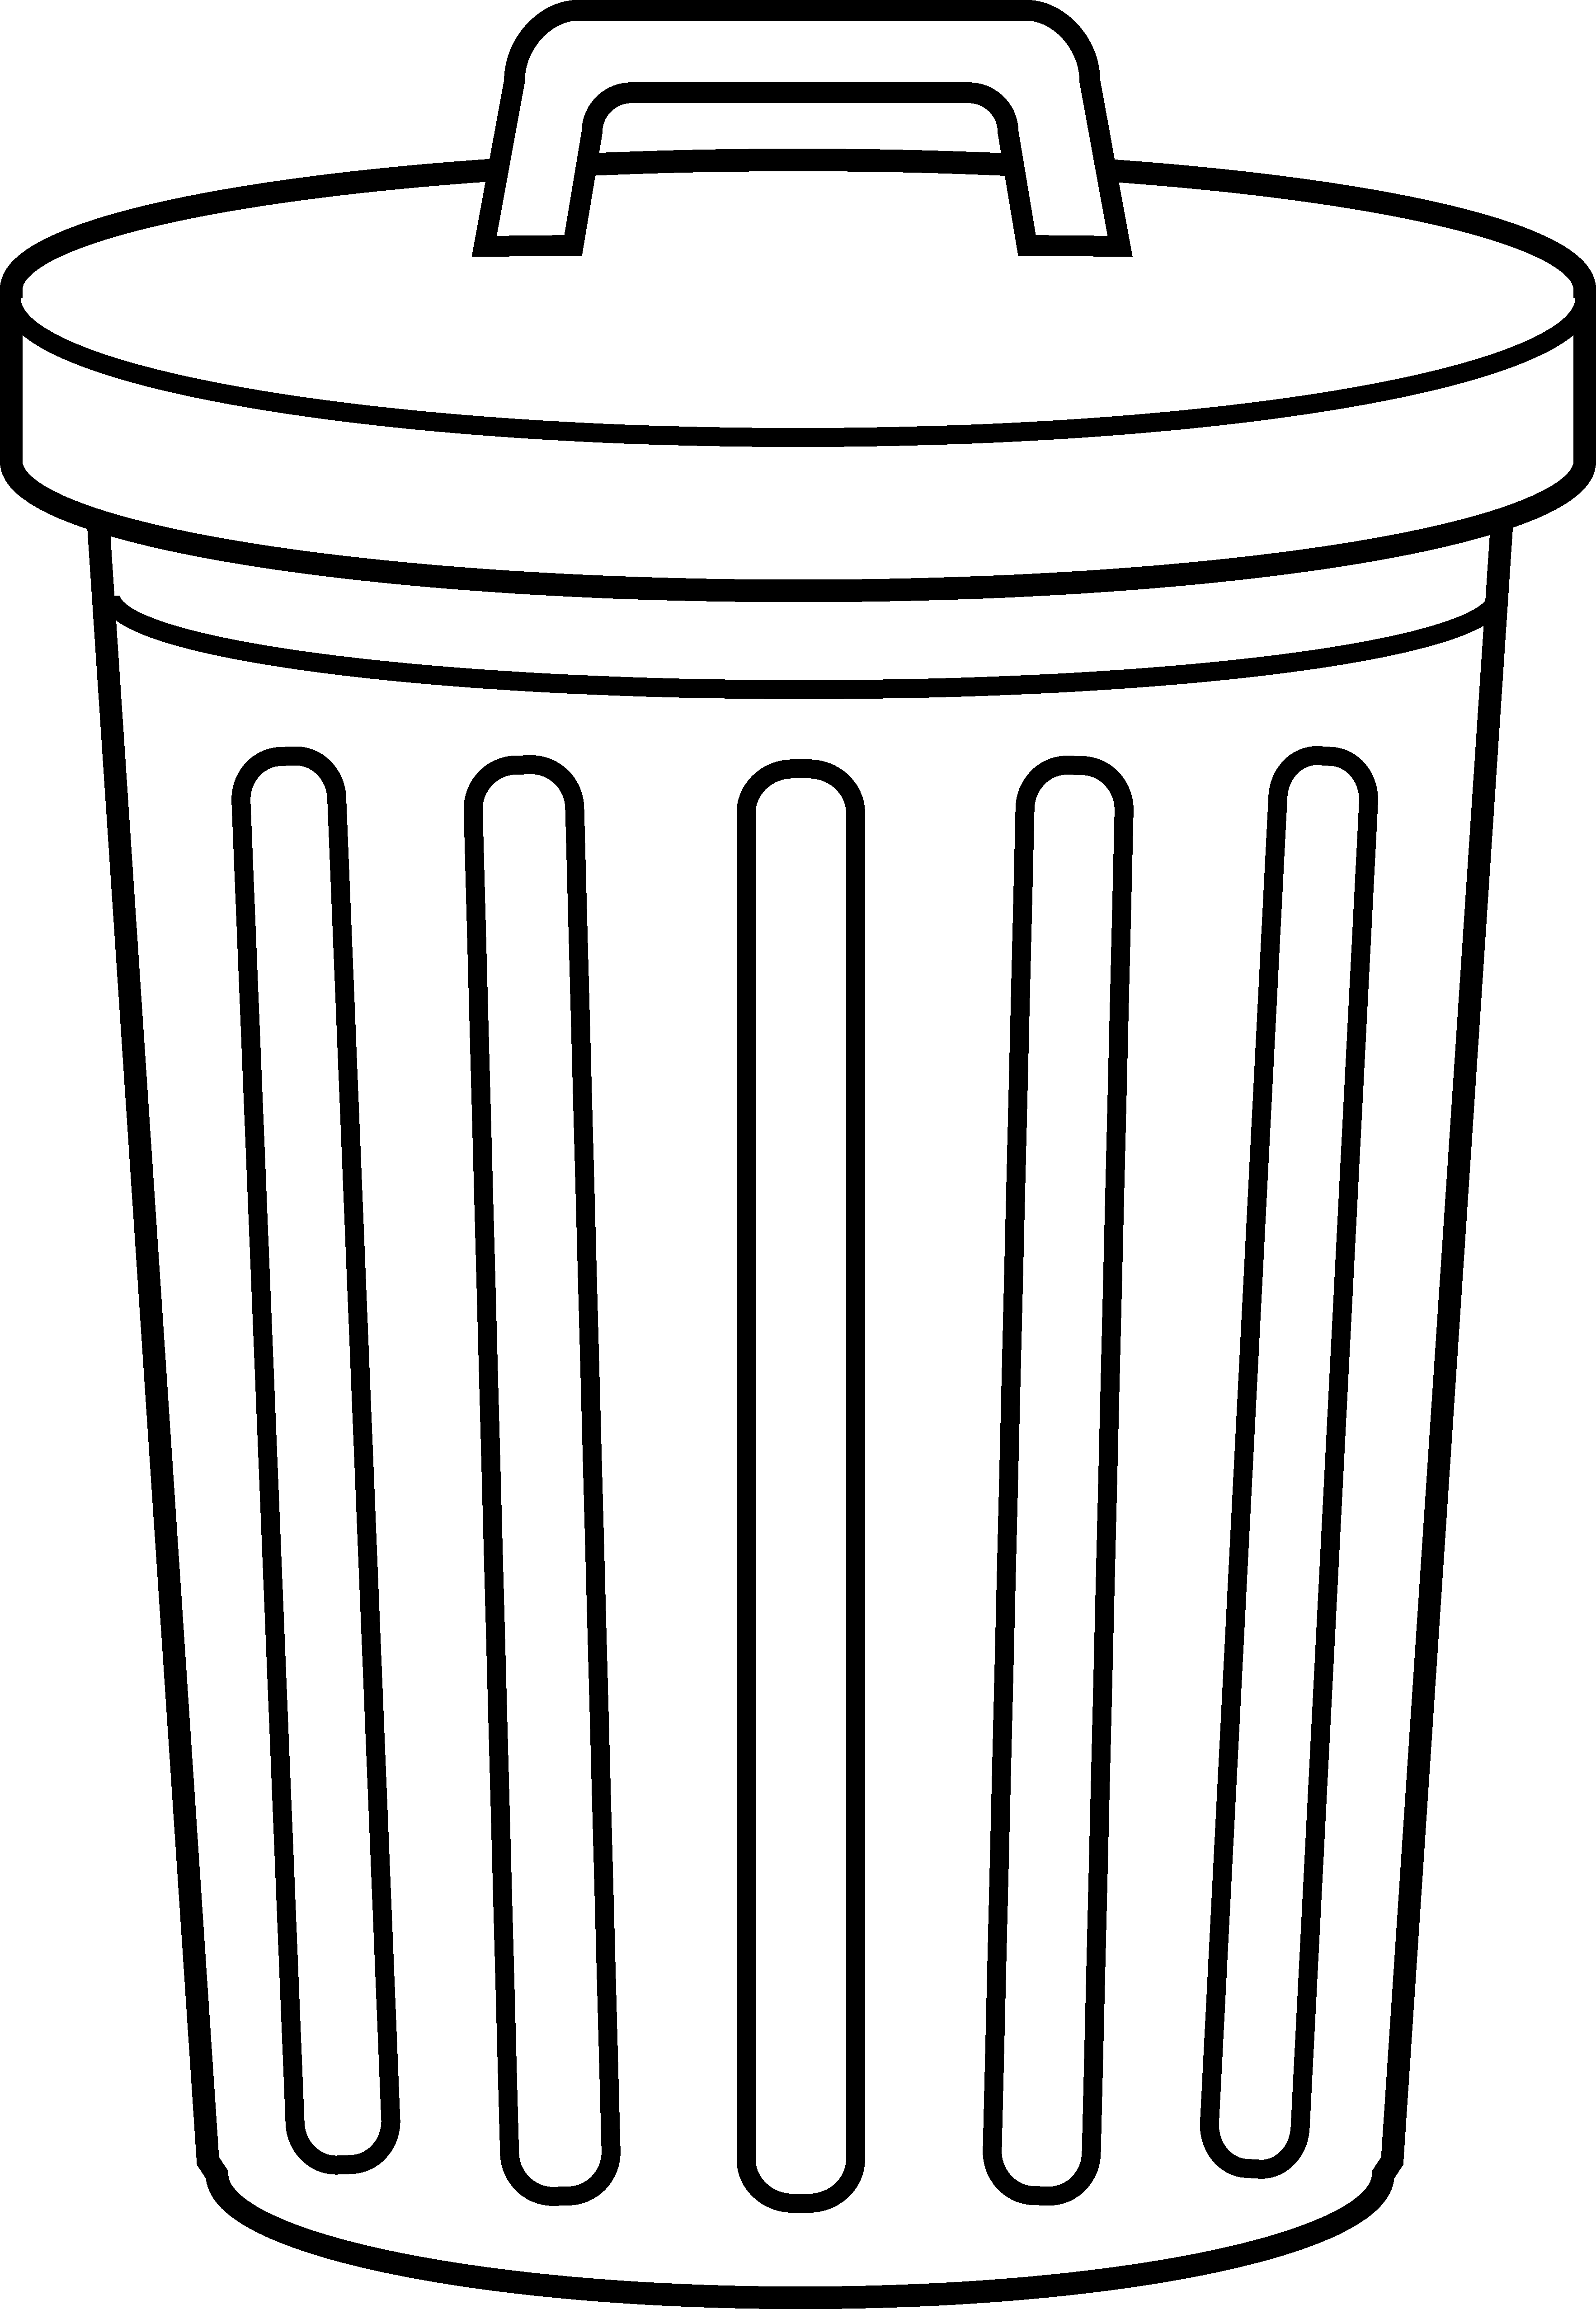 Garbage Can Line Art - Free .-Garbage Can Line Art - Free .-8